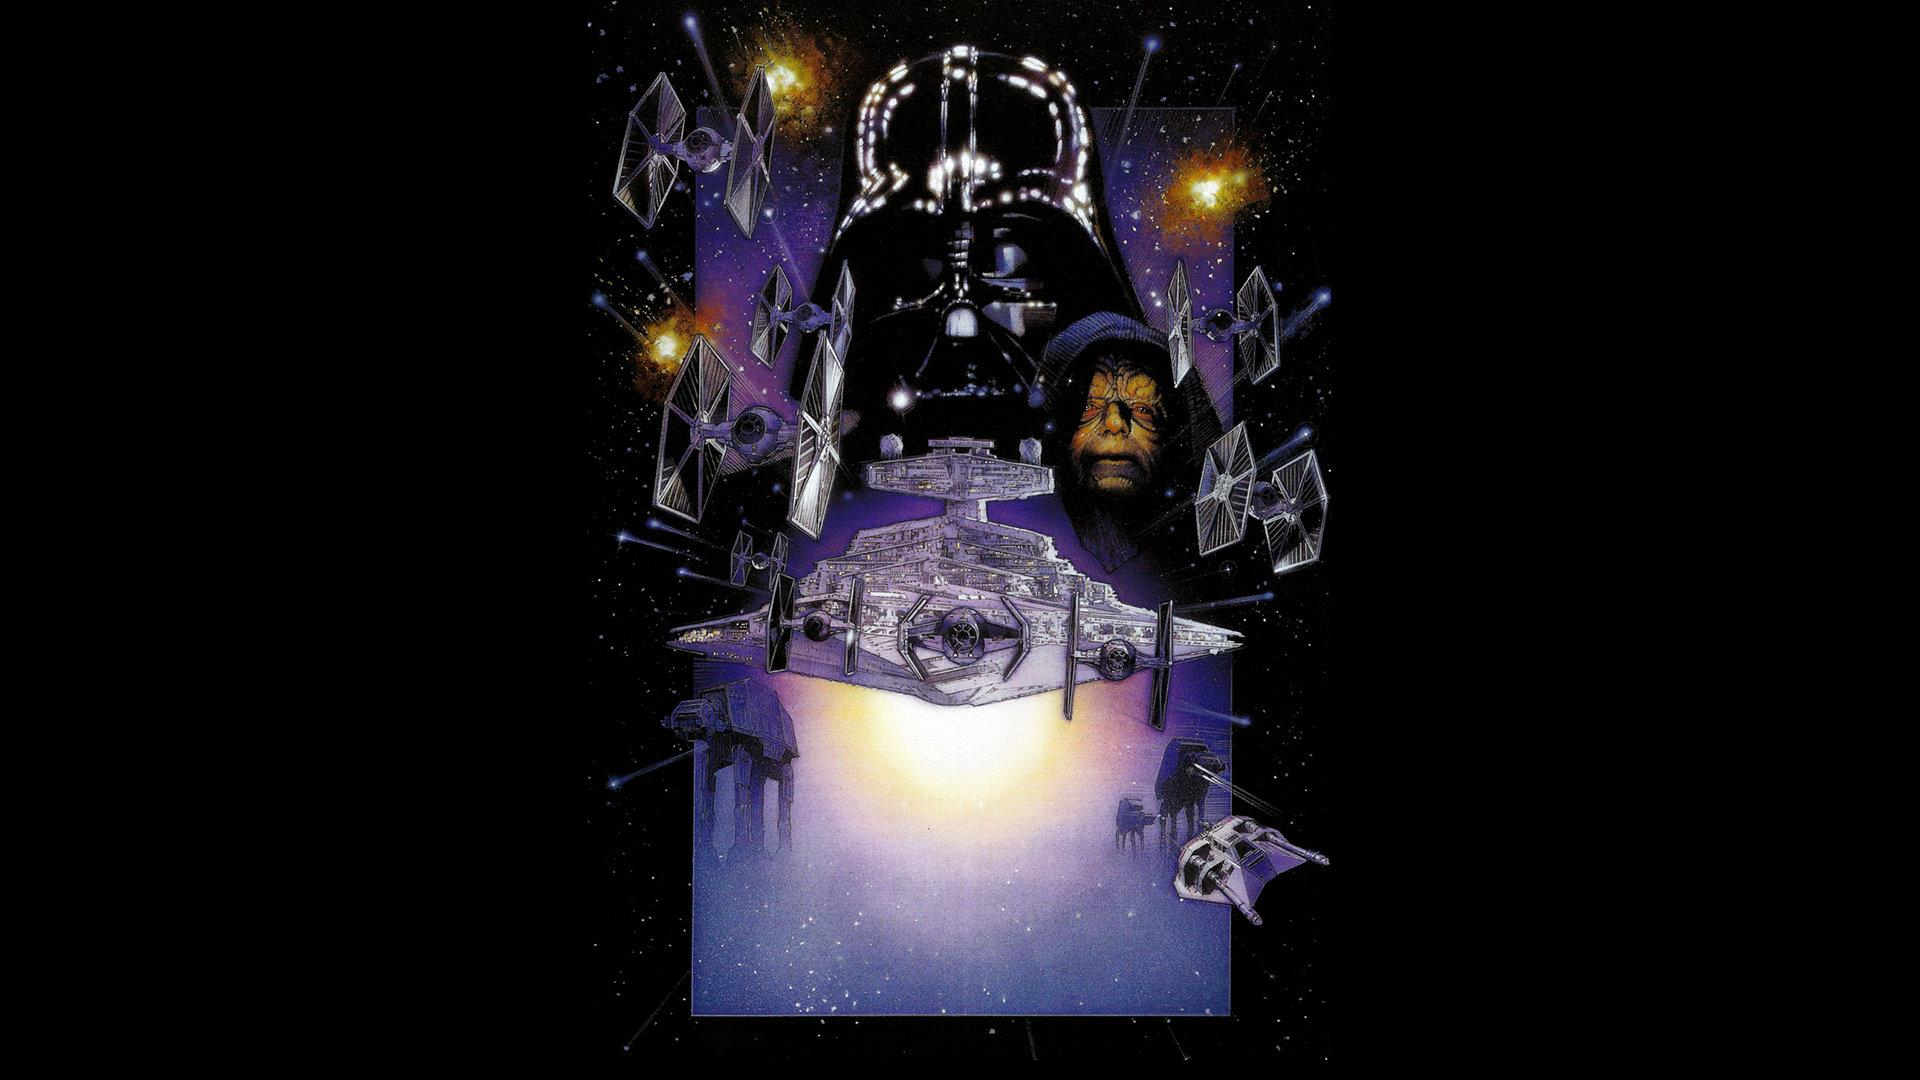 Best Star Wars Episode 5 V The Empire Strikes Back Wallpaper Id